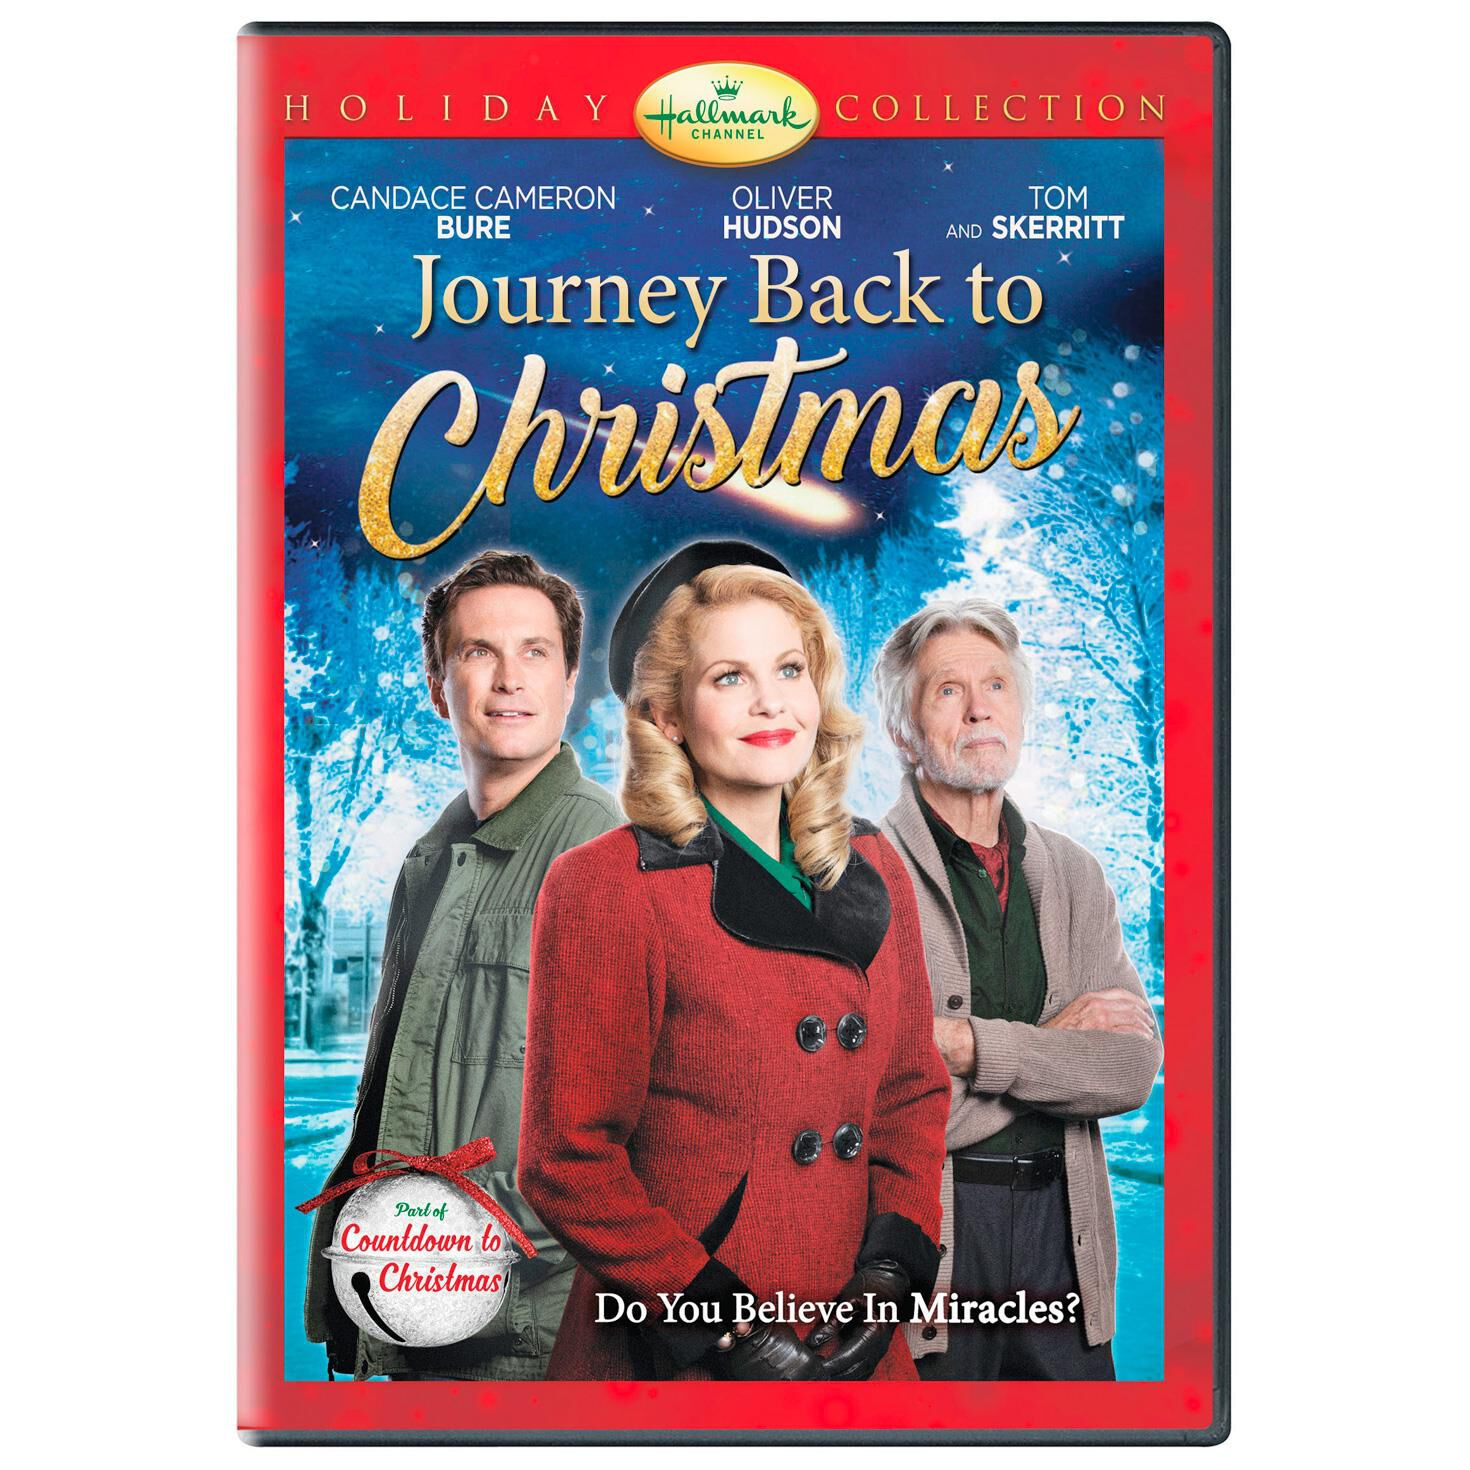 Journey Back to Christmas DVD - Hallmark Channel - Hallmark